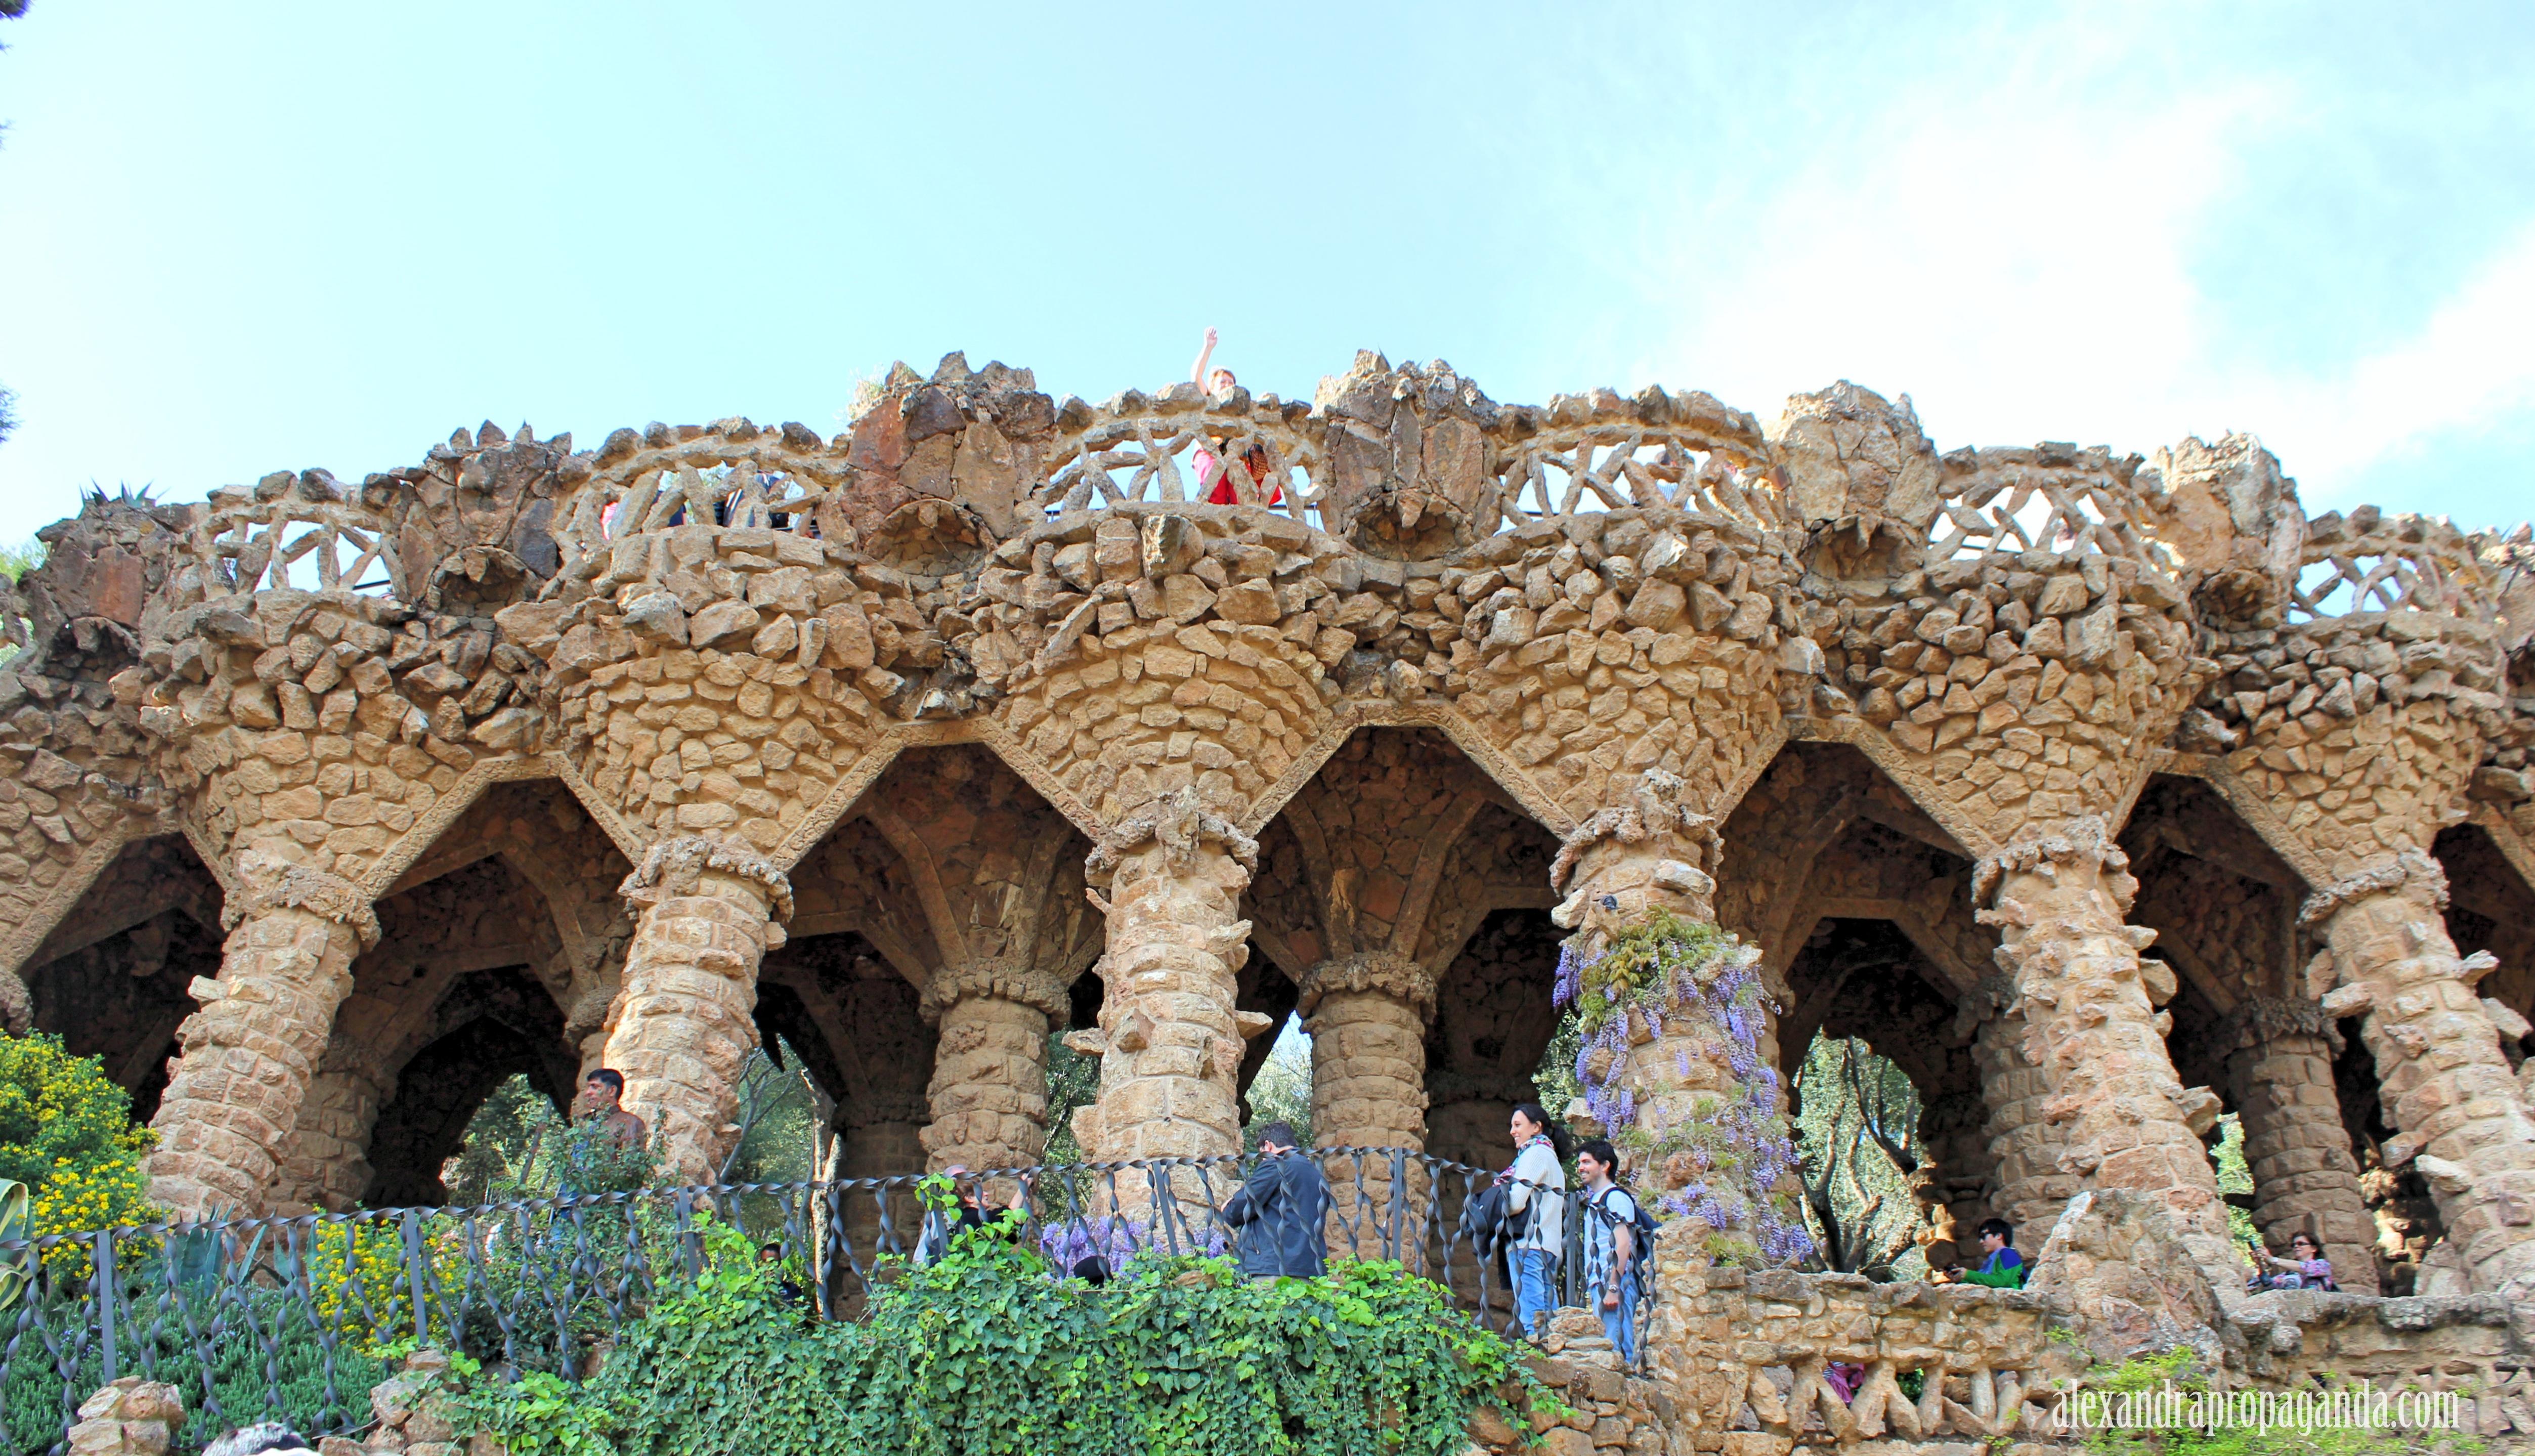 Park Güell and La Sagrada Familia in Barcelona, Spain  Alexandra Propaganda